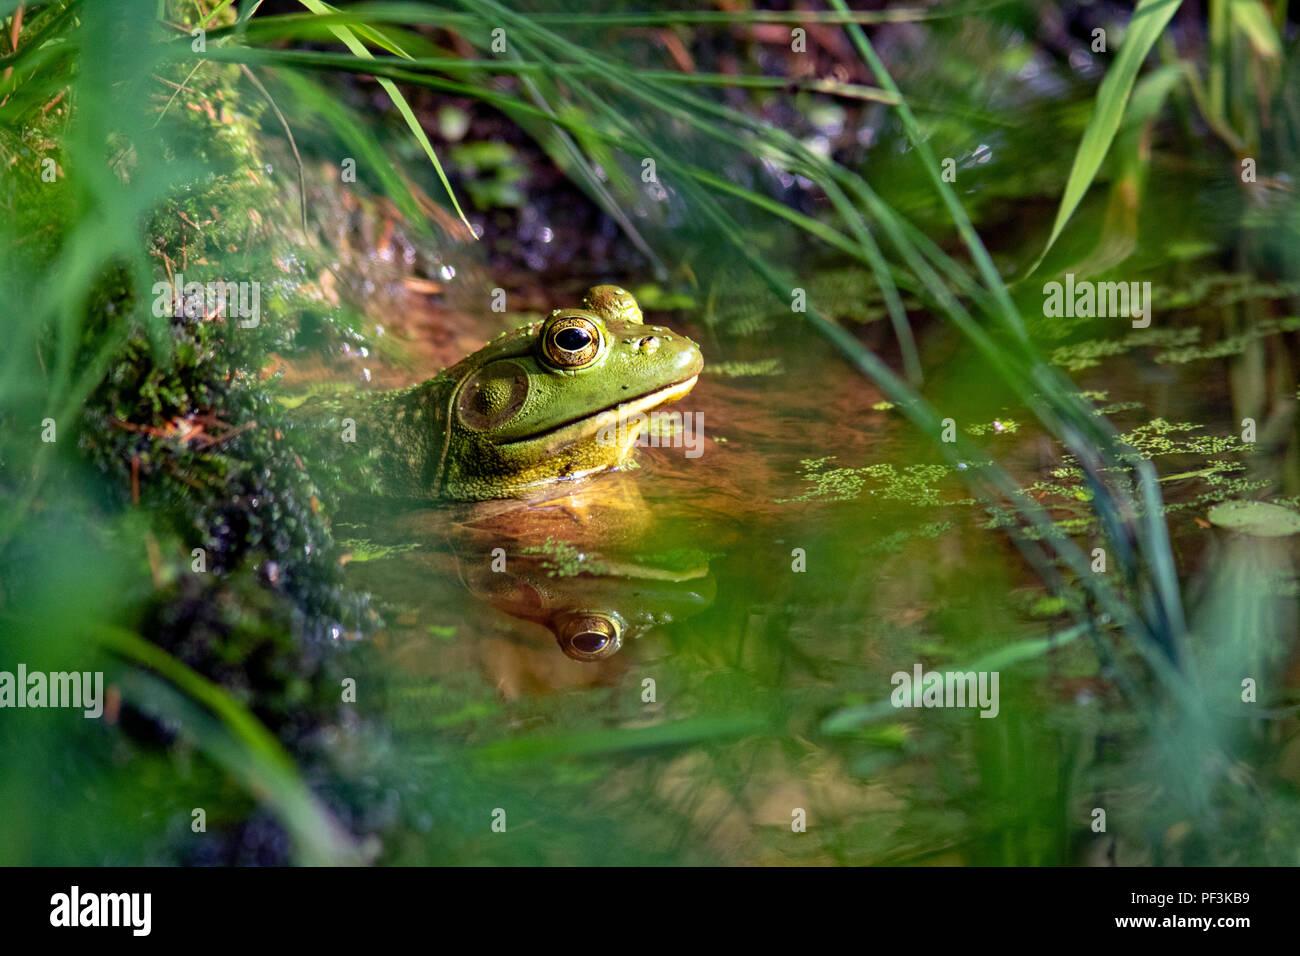 American Bullfrog (Lithobates catesbeianus) - Indian Point Trail - Il Giardino degli dèi, Shawnee National Forest, Illinois, Stati Uniti d'America Foto Stock